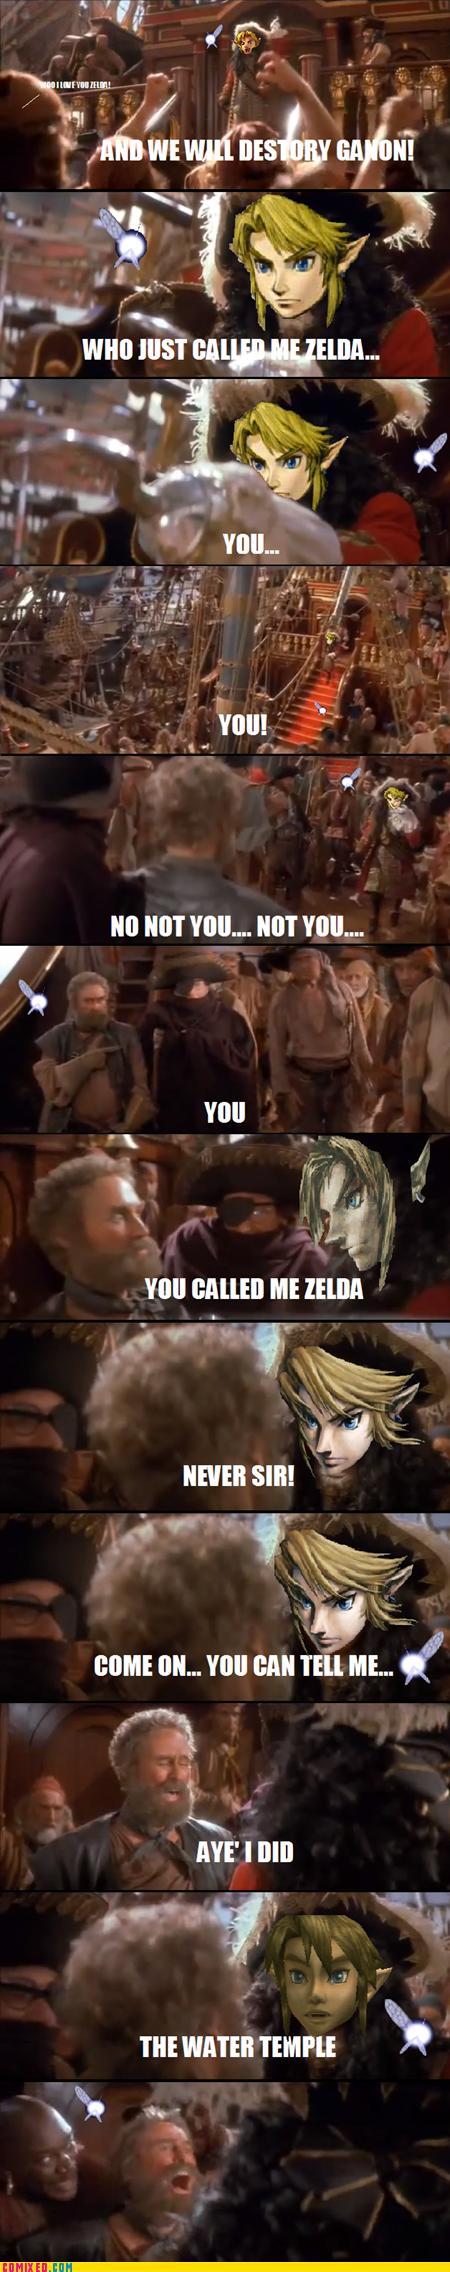 Its Link Dammit. .. hell hook was badass!